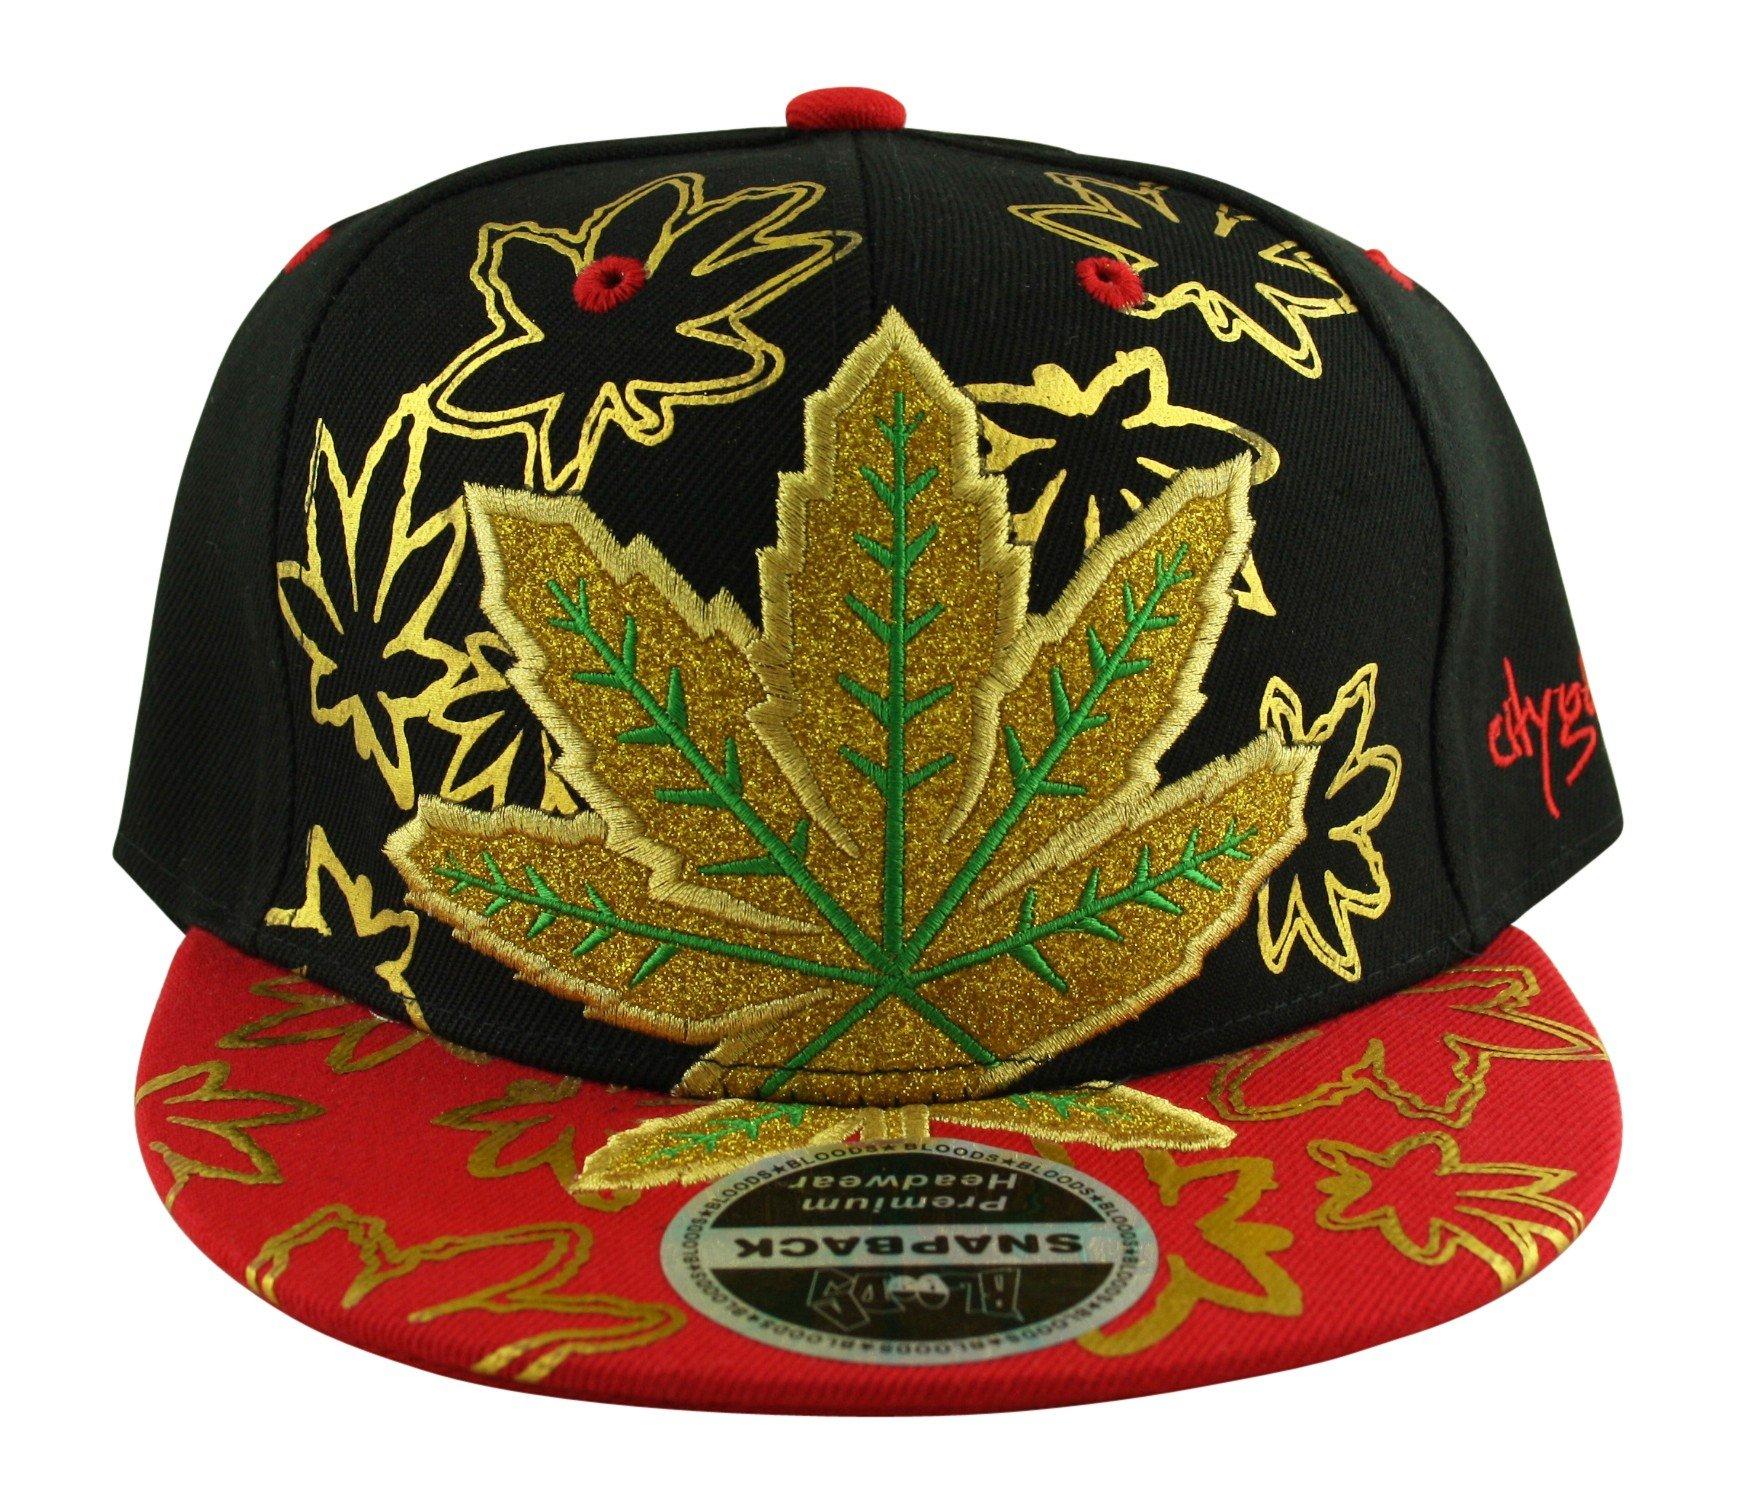 Men's 420 Ganja Leaf Weed Rasta Gold Embroided Snapback Flat Peak Baseball Cap